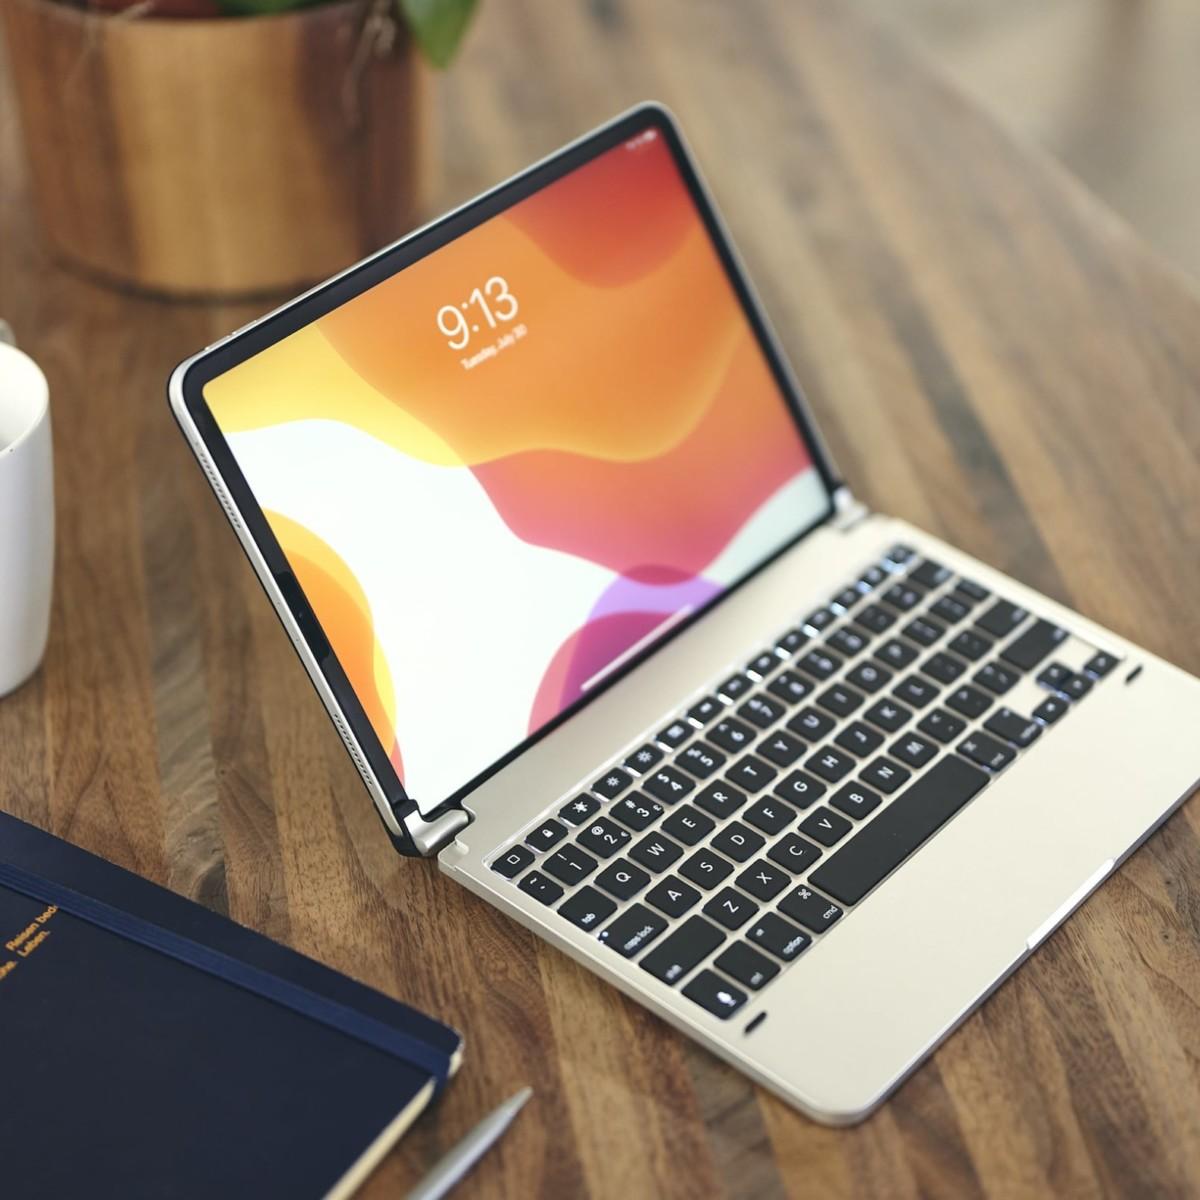 Brydge Pro iPad Pro Keyboard turns your iPad into a laptop